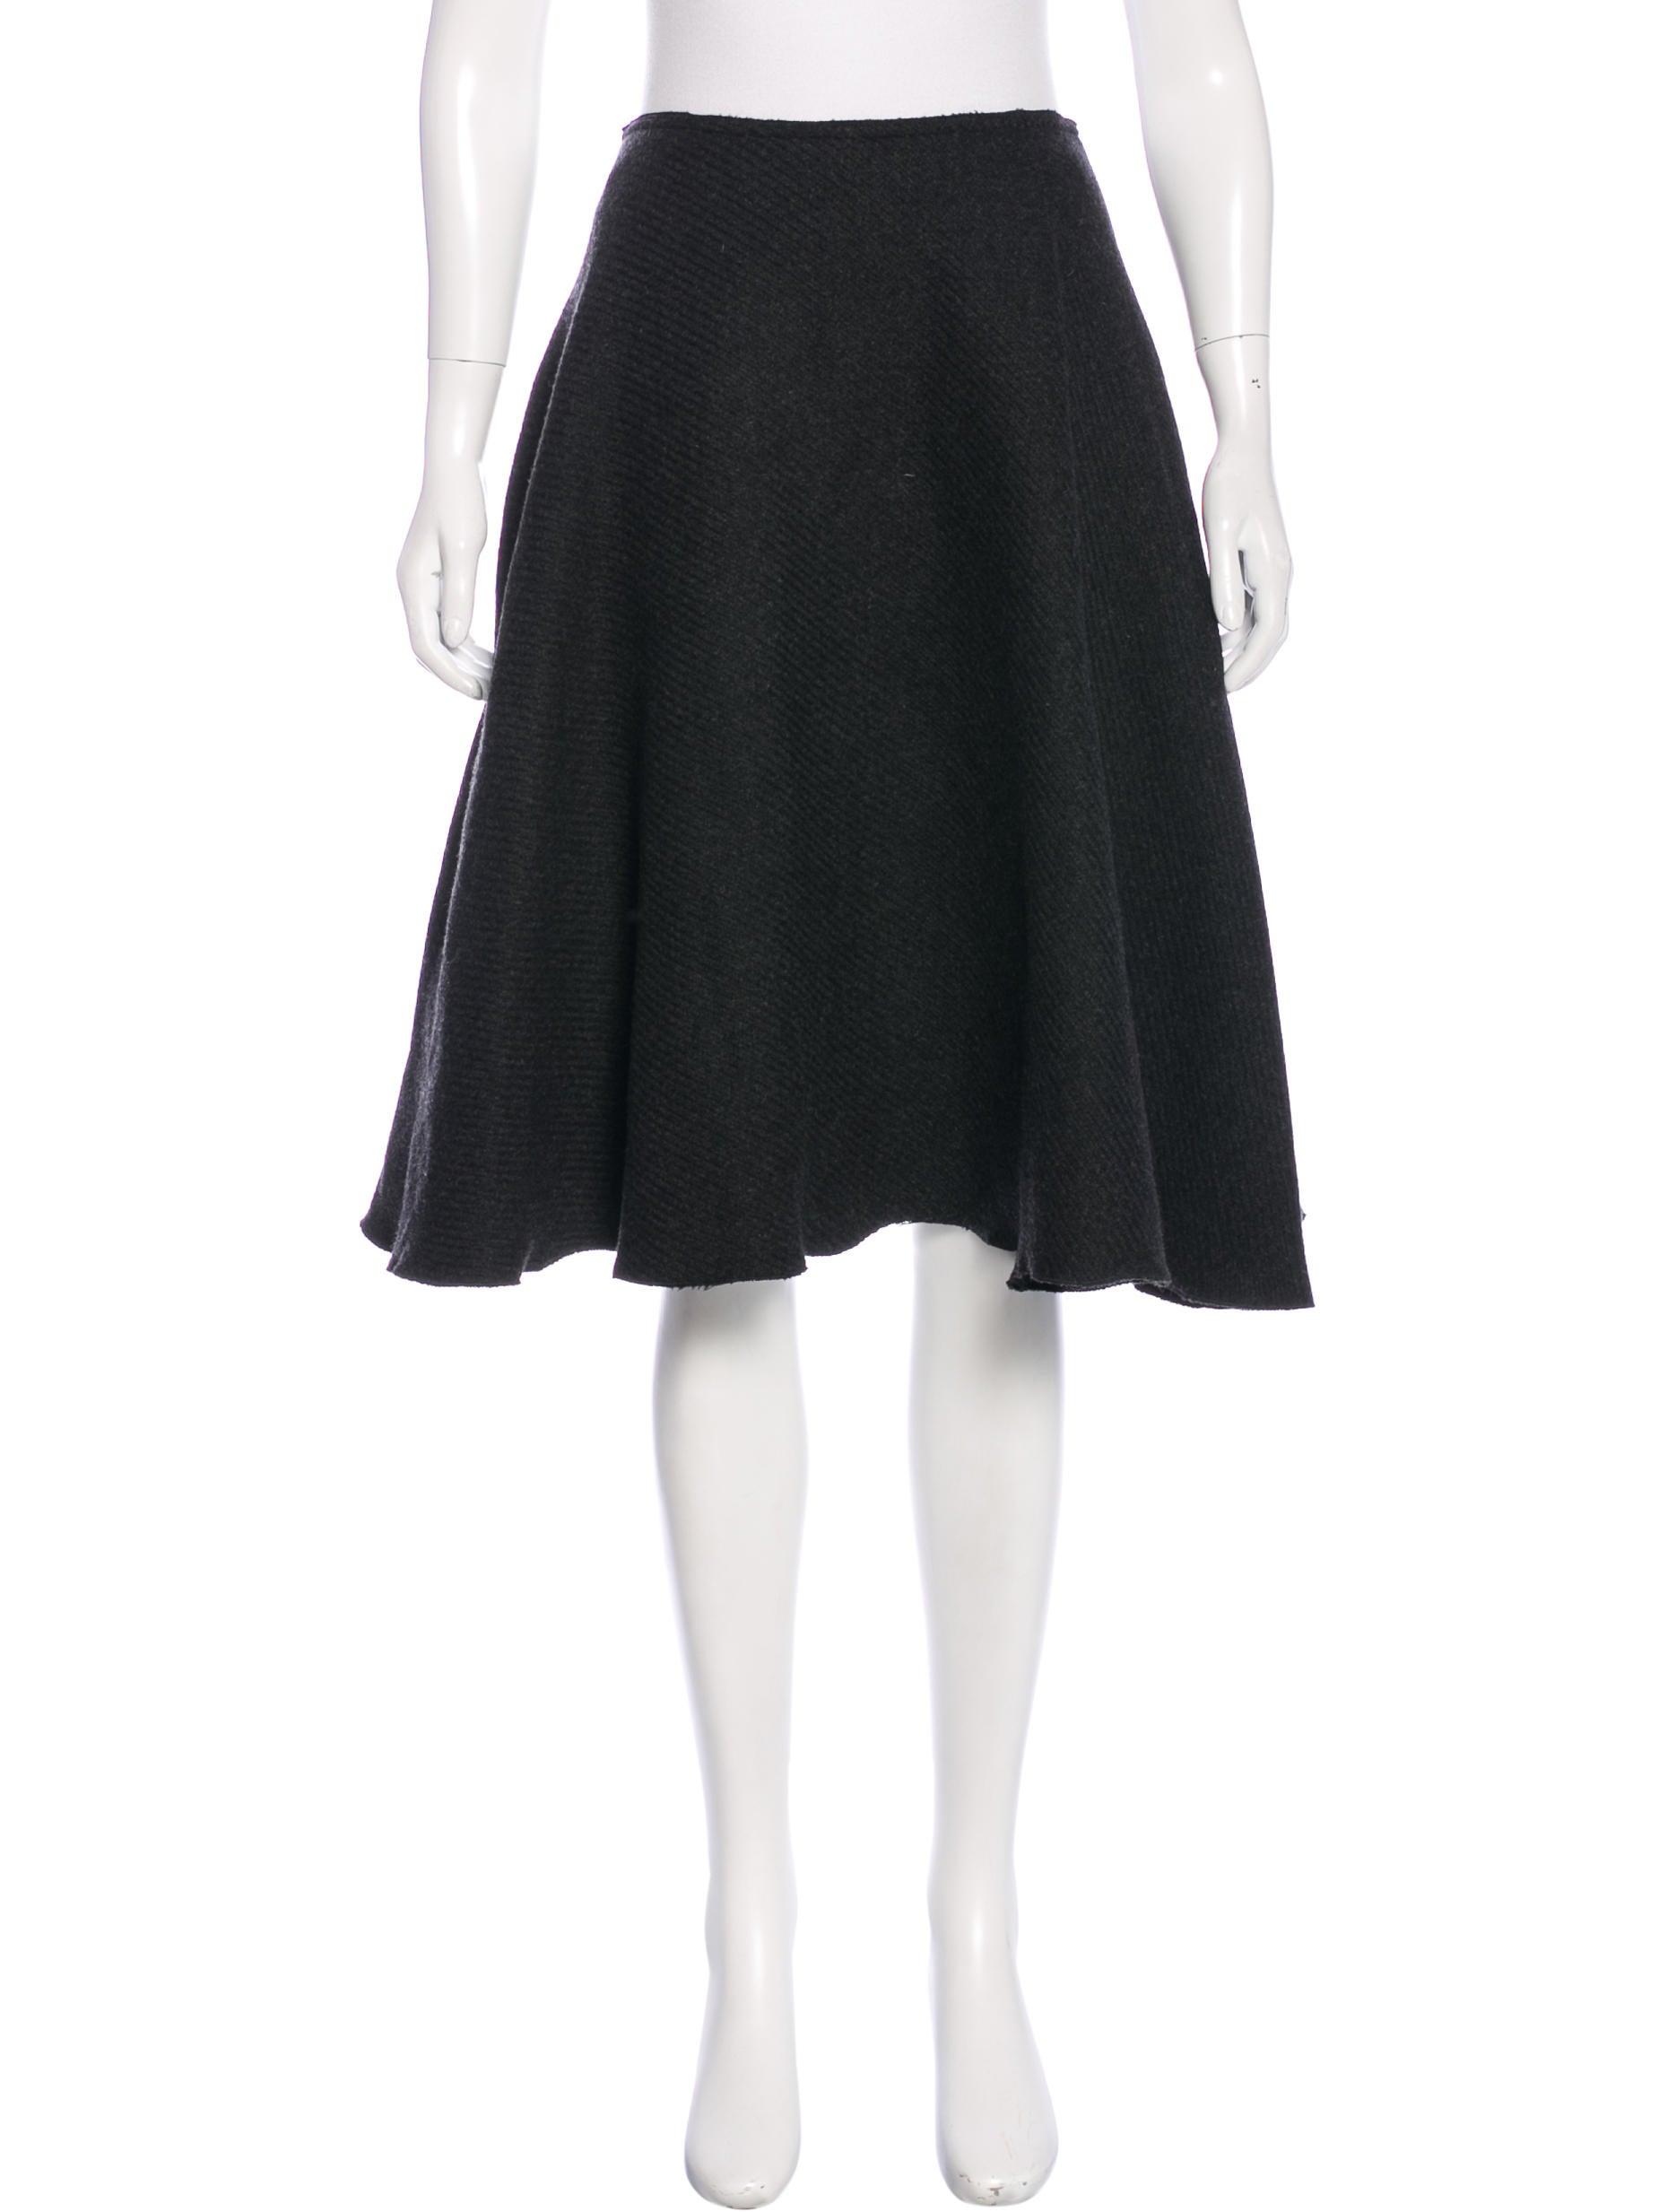 prada wool a line skirt clothing pra144823 the realreal